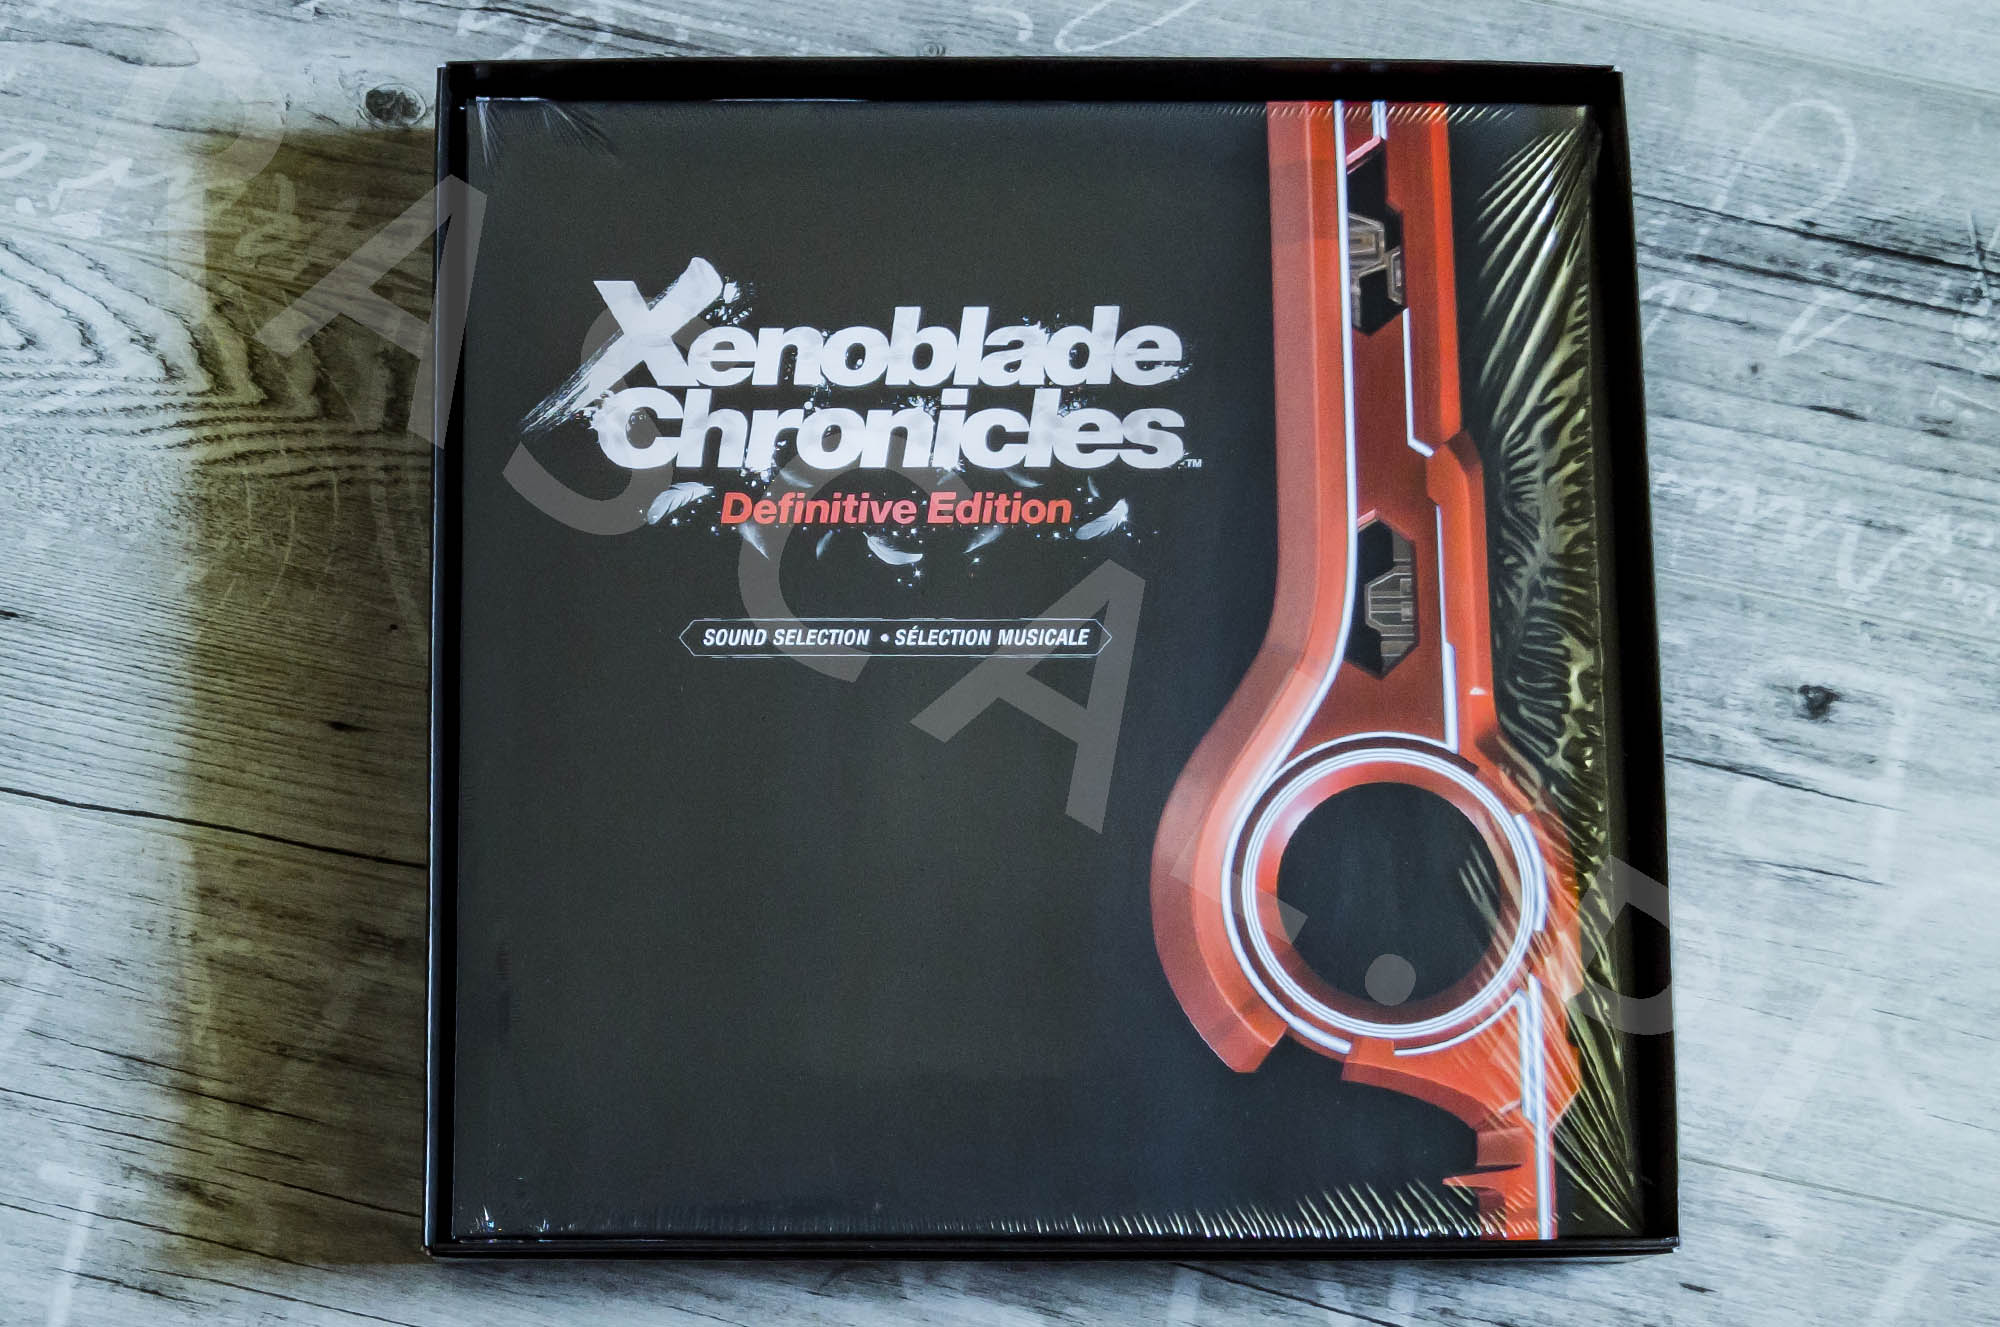 Xenoblade Chronicles Definitive Edition Collectors Set - Vinyl